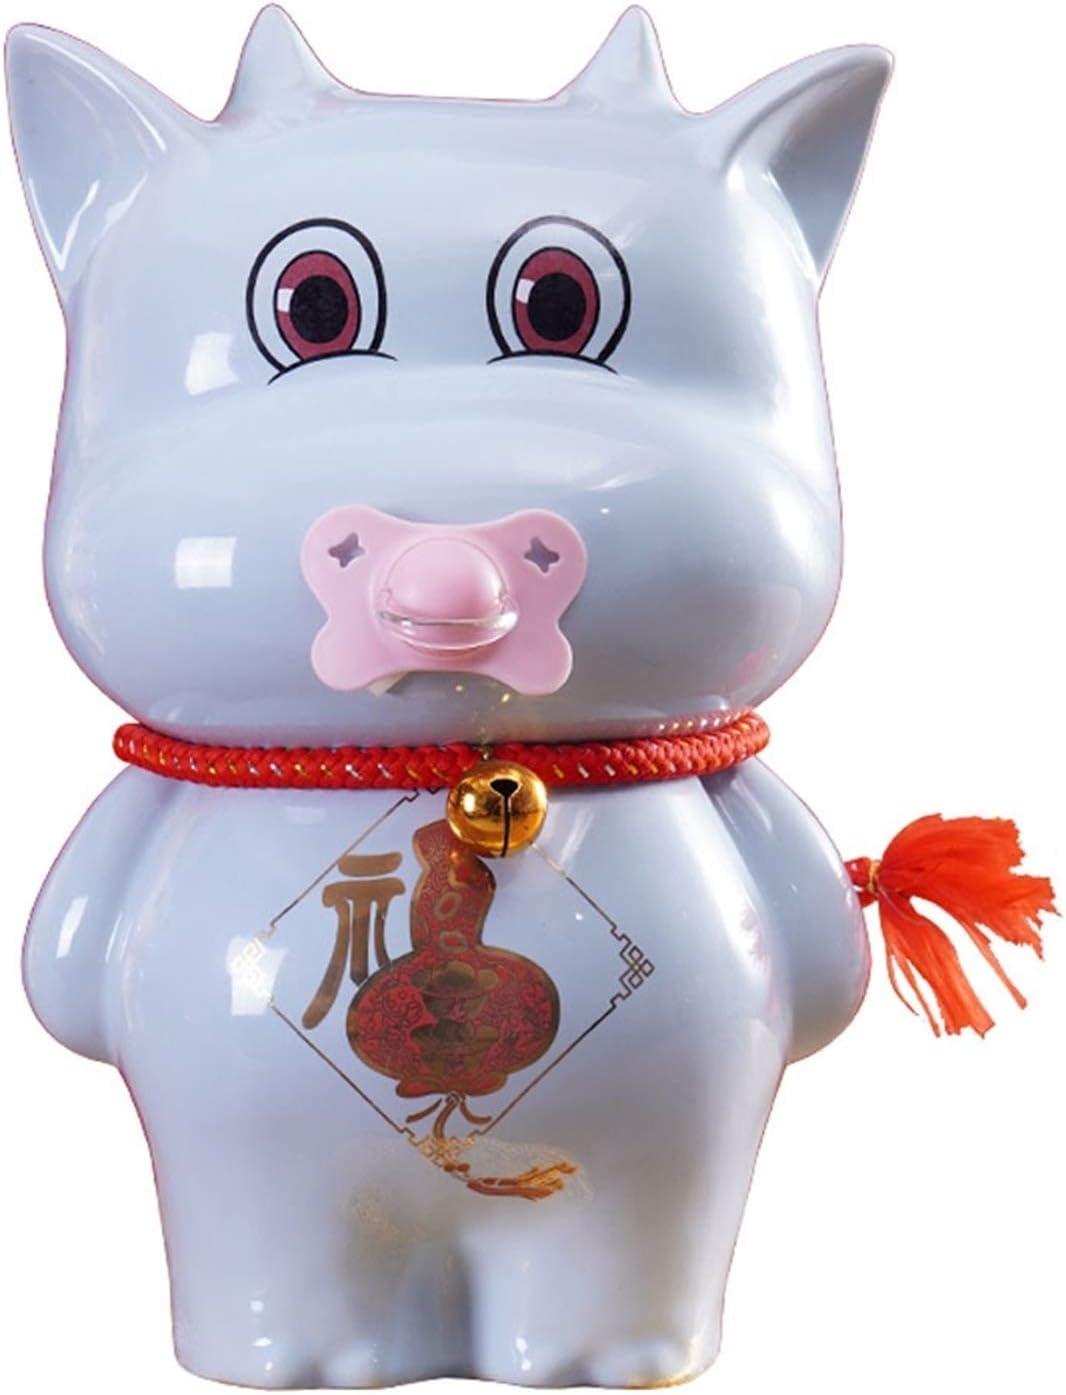 Max 62% OFF Liushop Piggy Bank Cute Calf Fixed price for sale Chil Creative